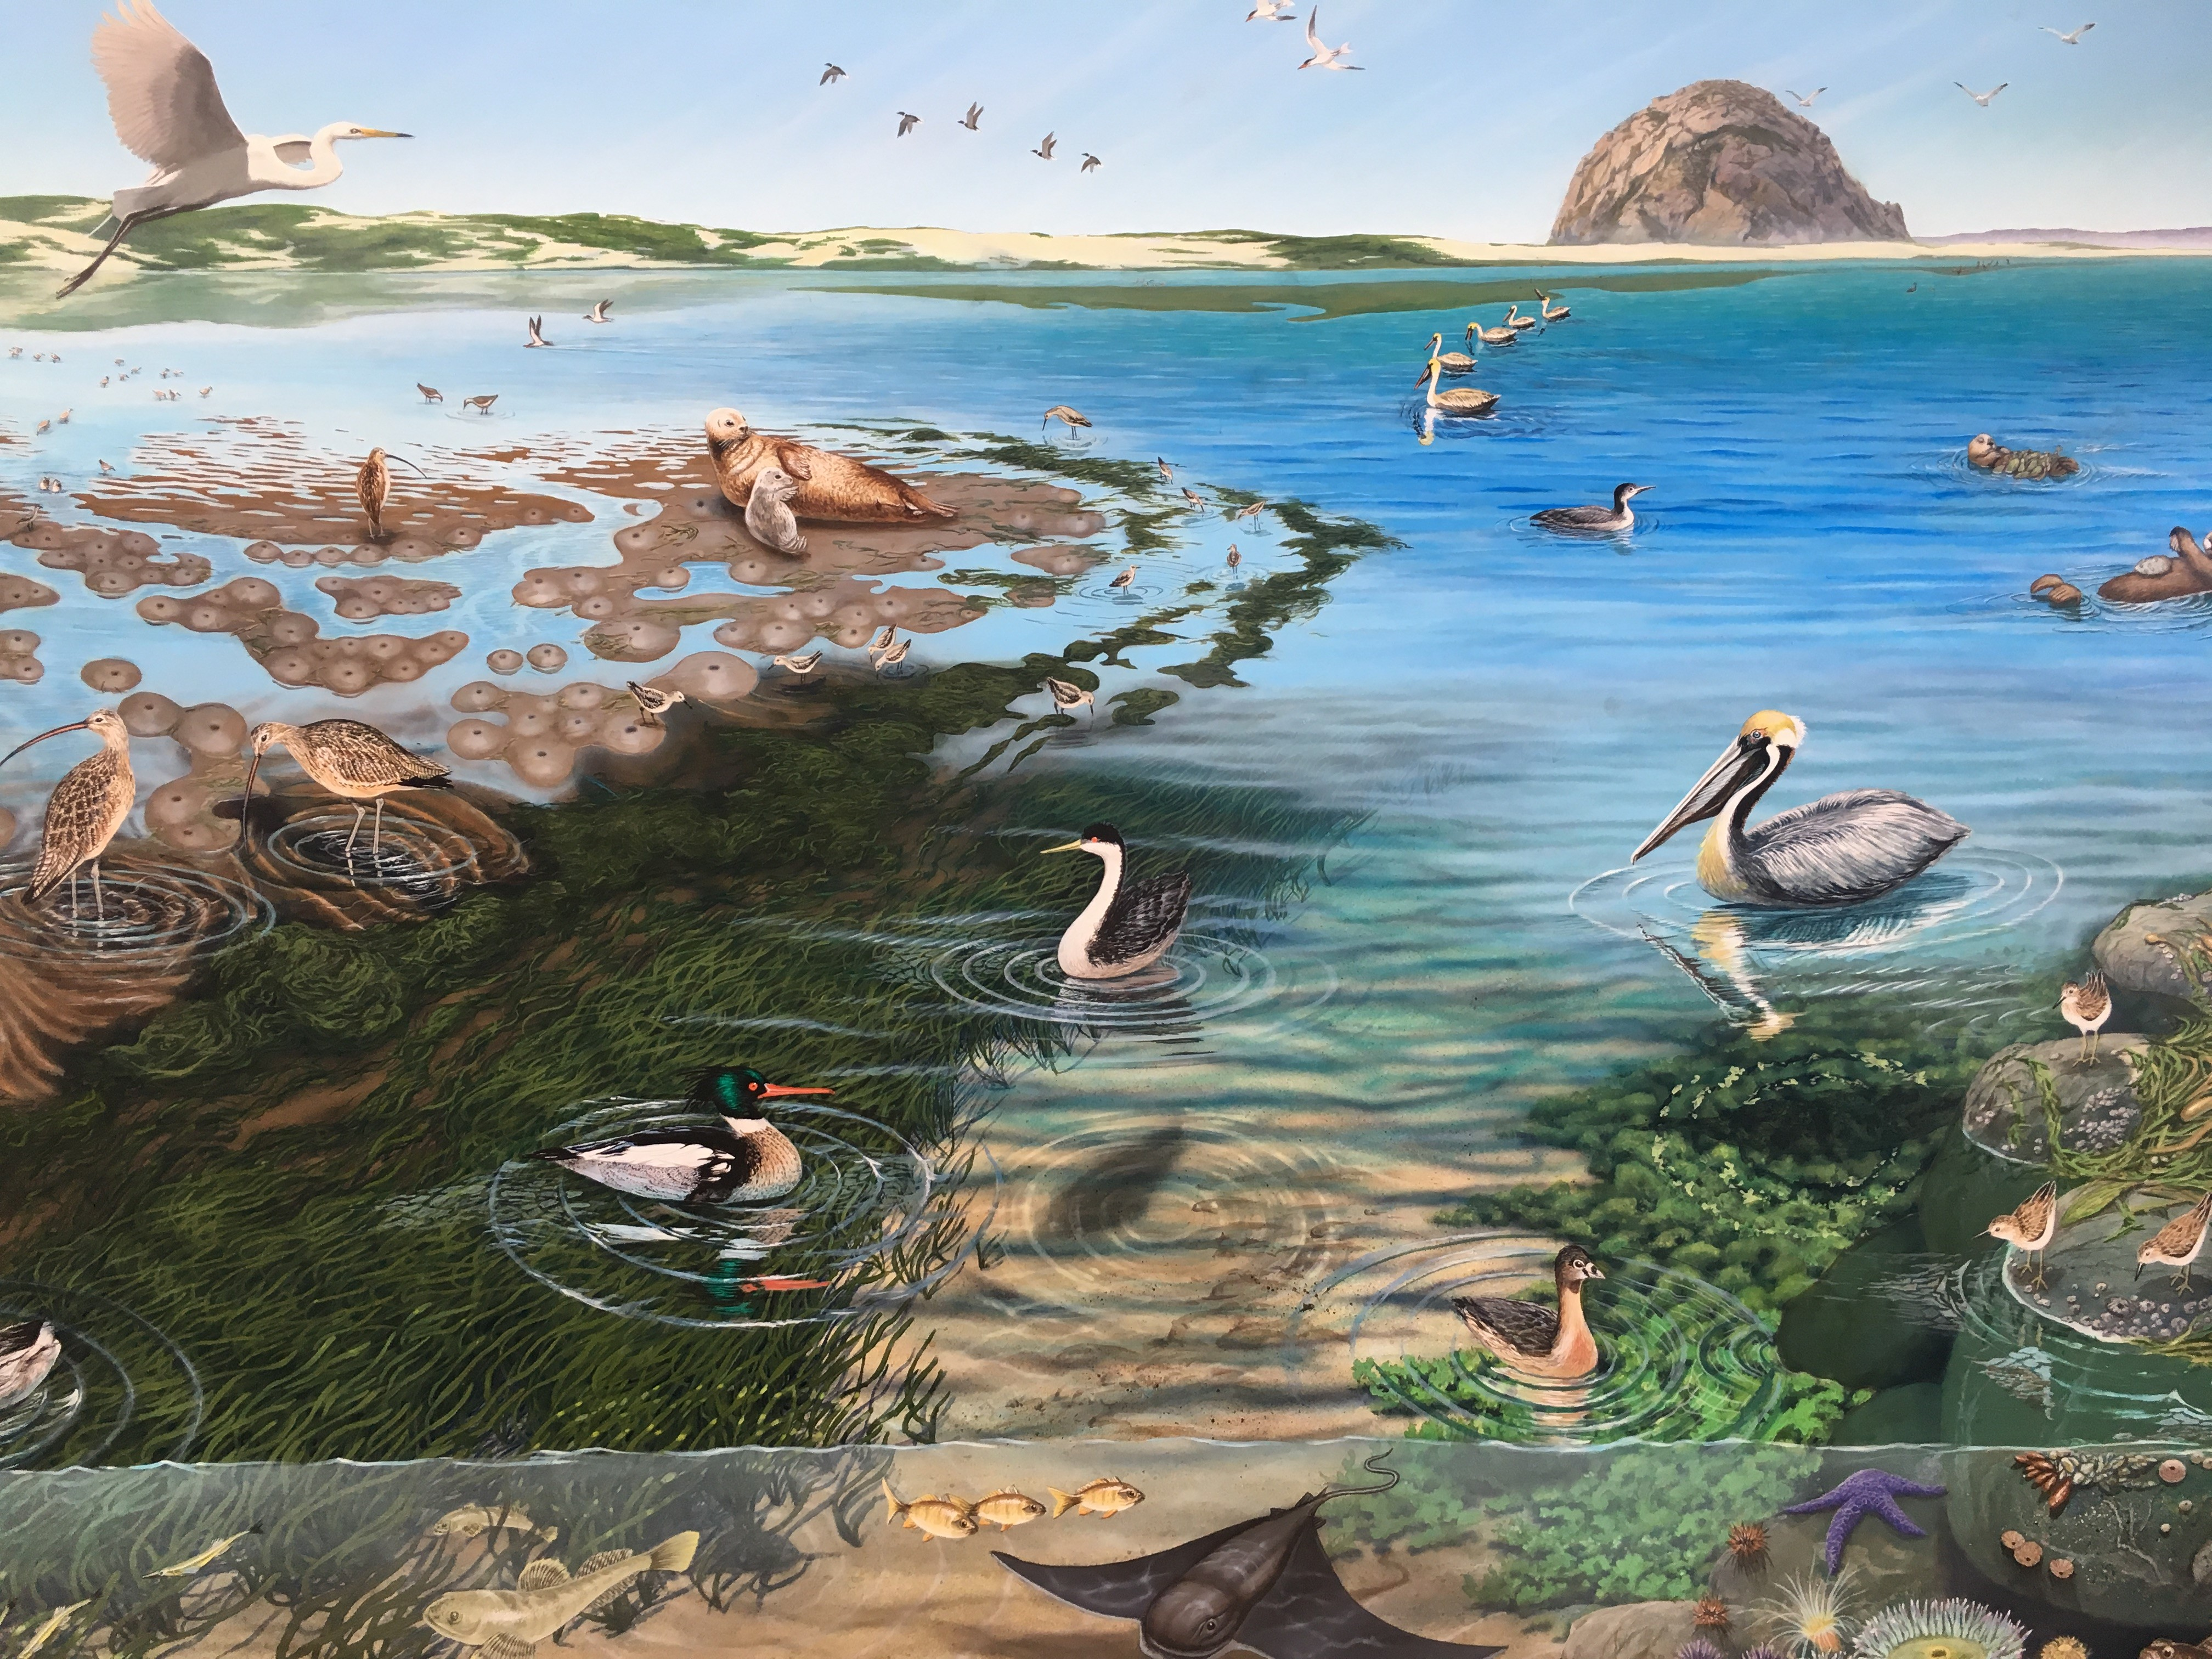 Morro Bay National Estuary Program